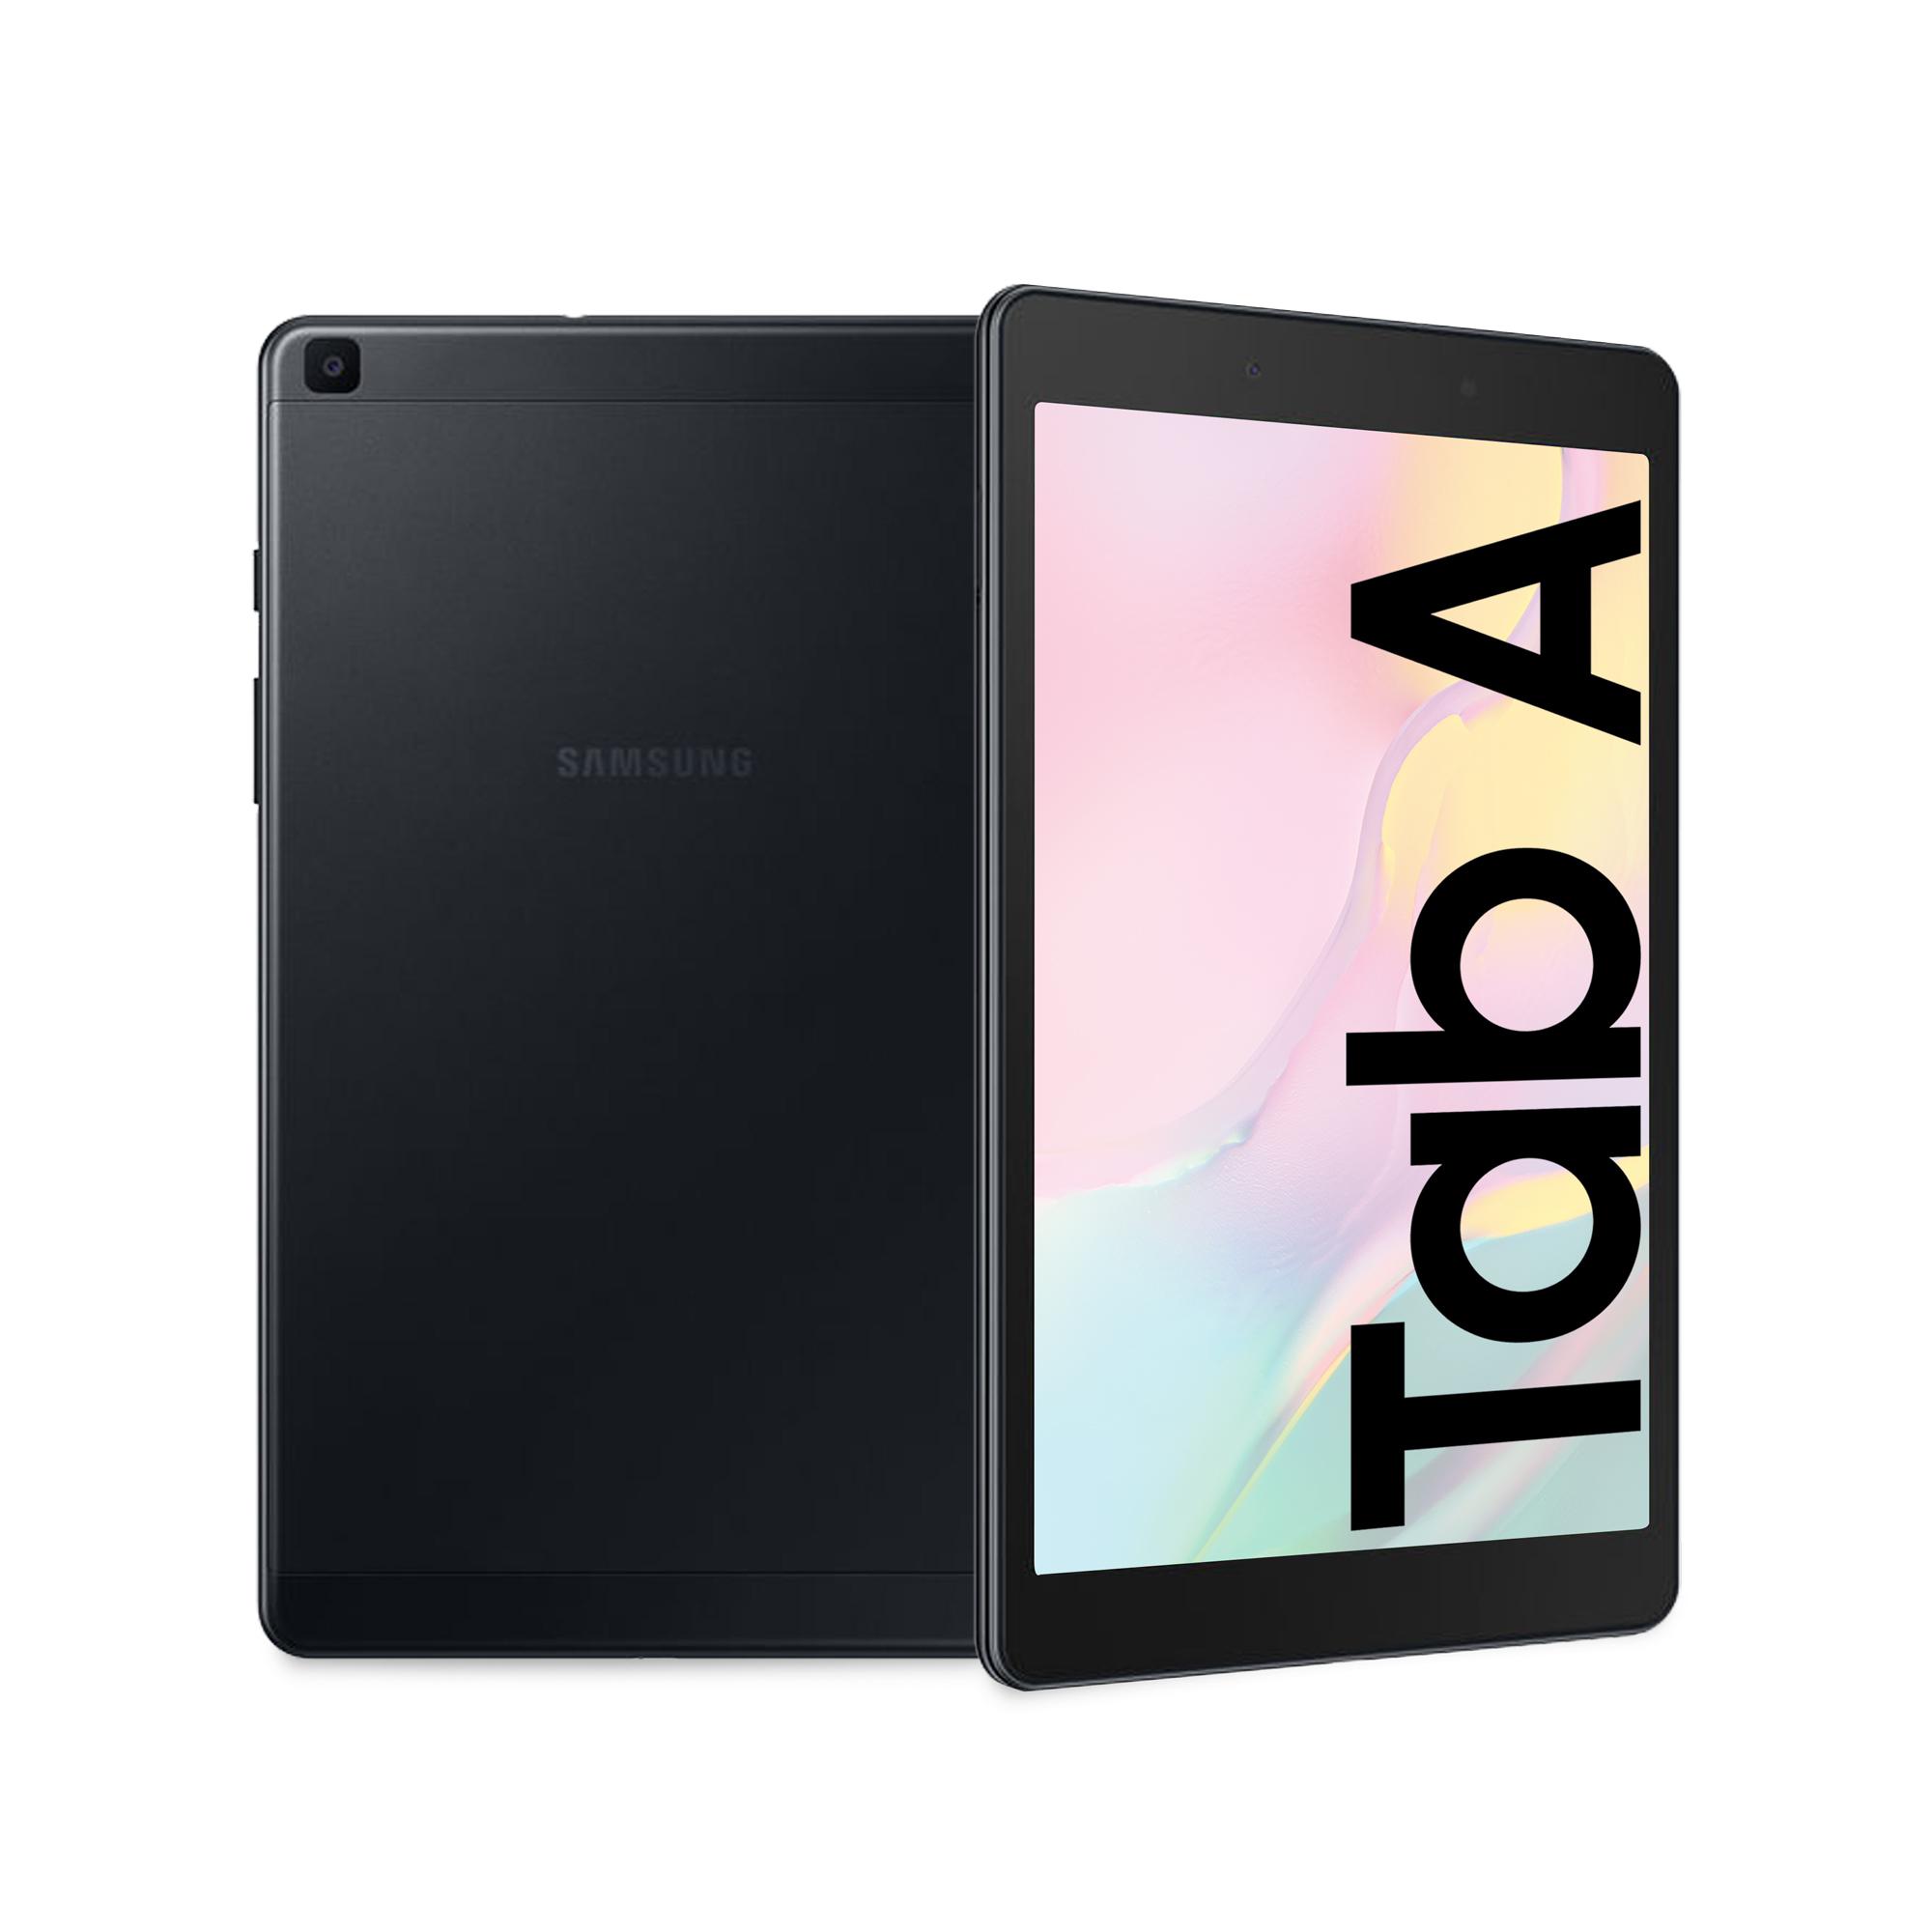 Tablet Sim Card Carrefour